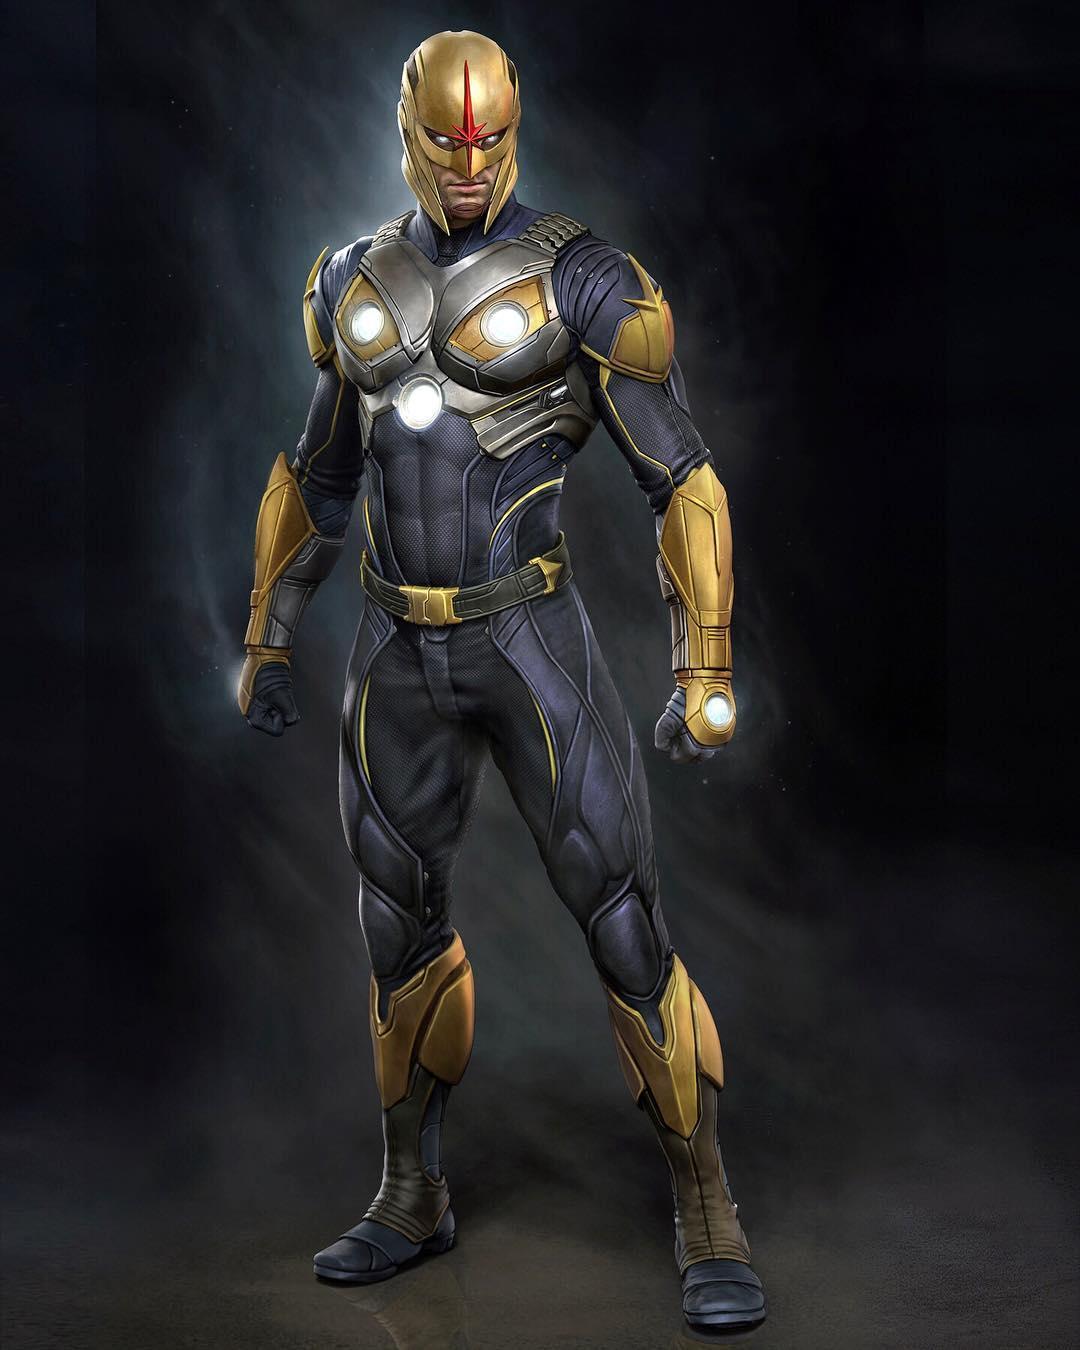 Nova Ultimate Marvel Cinematic Universe Wikia Fandom